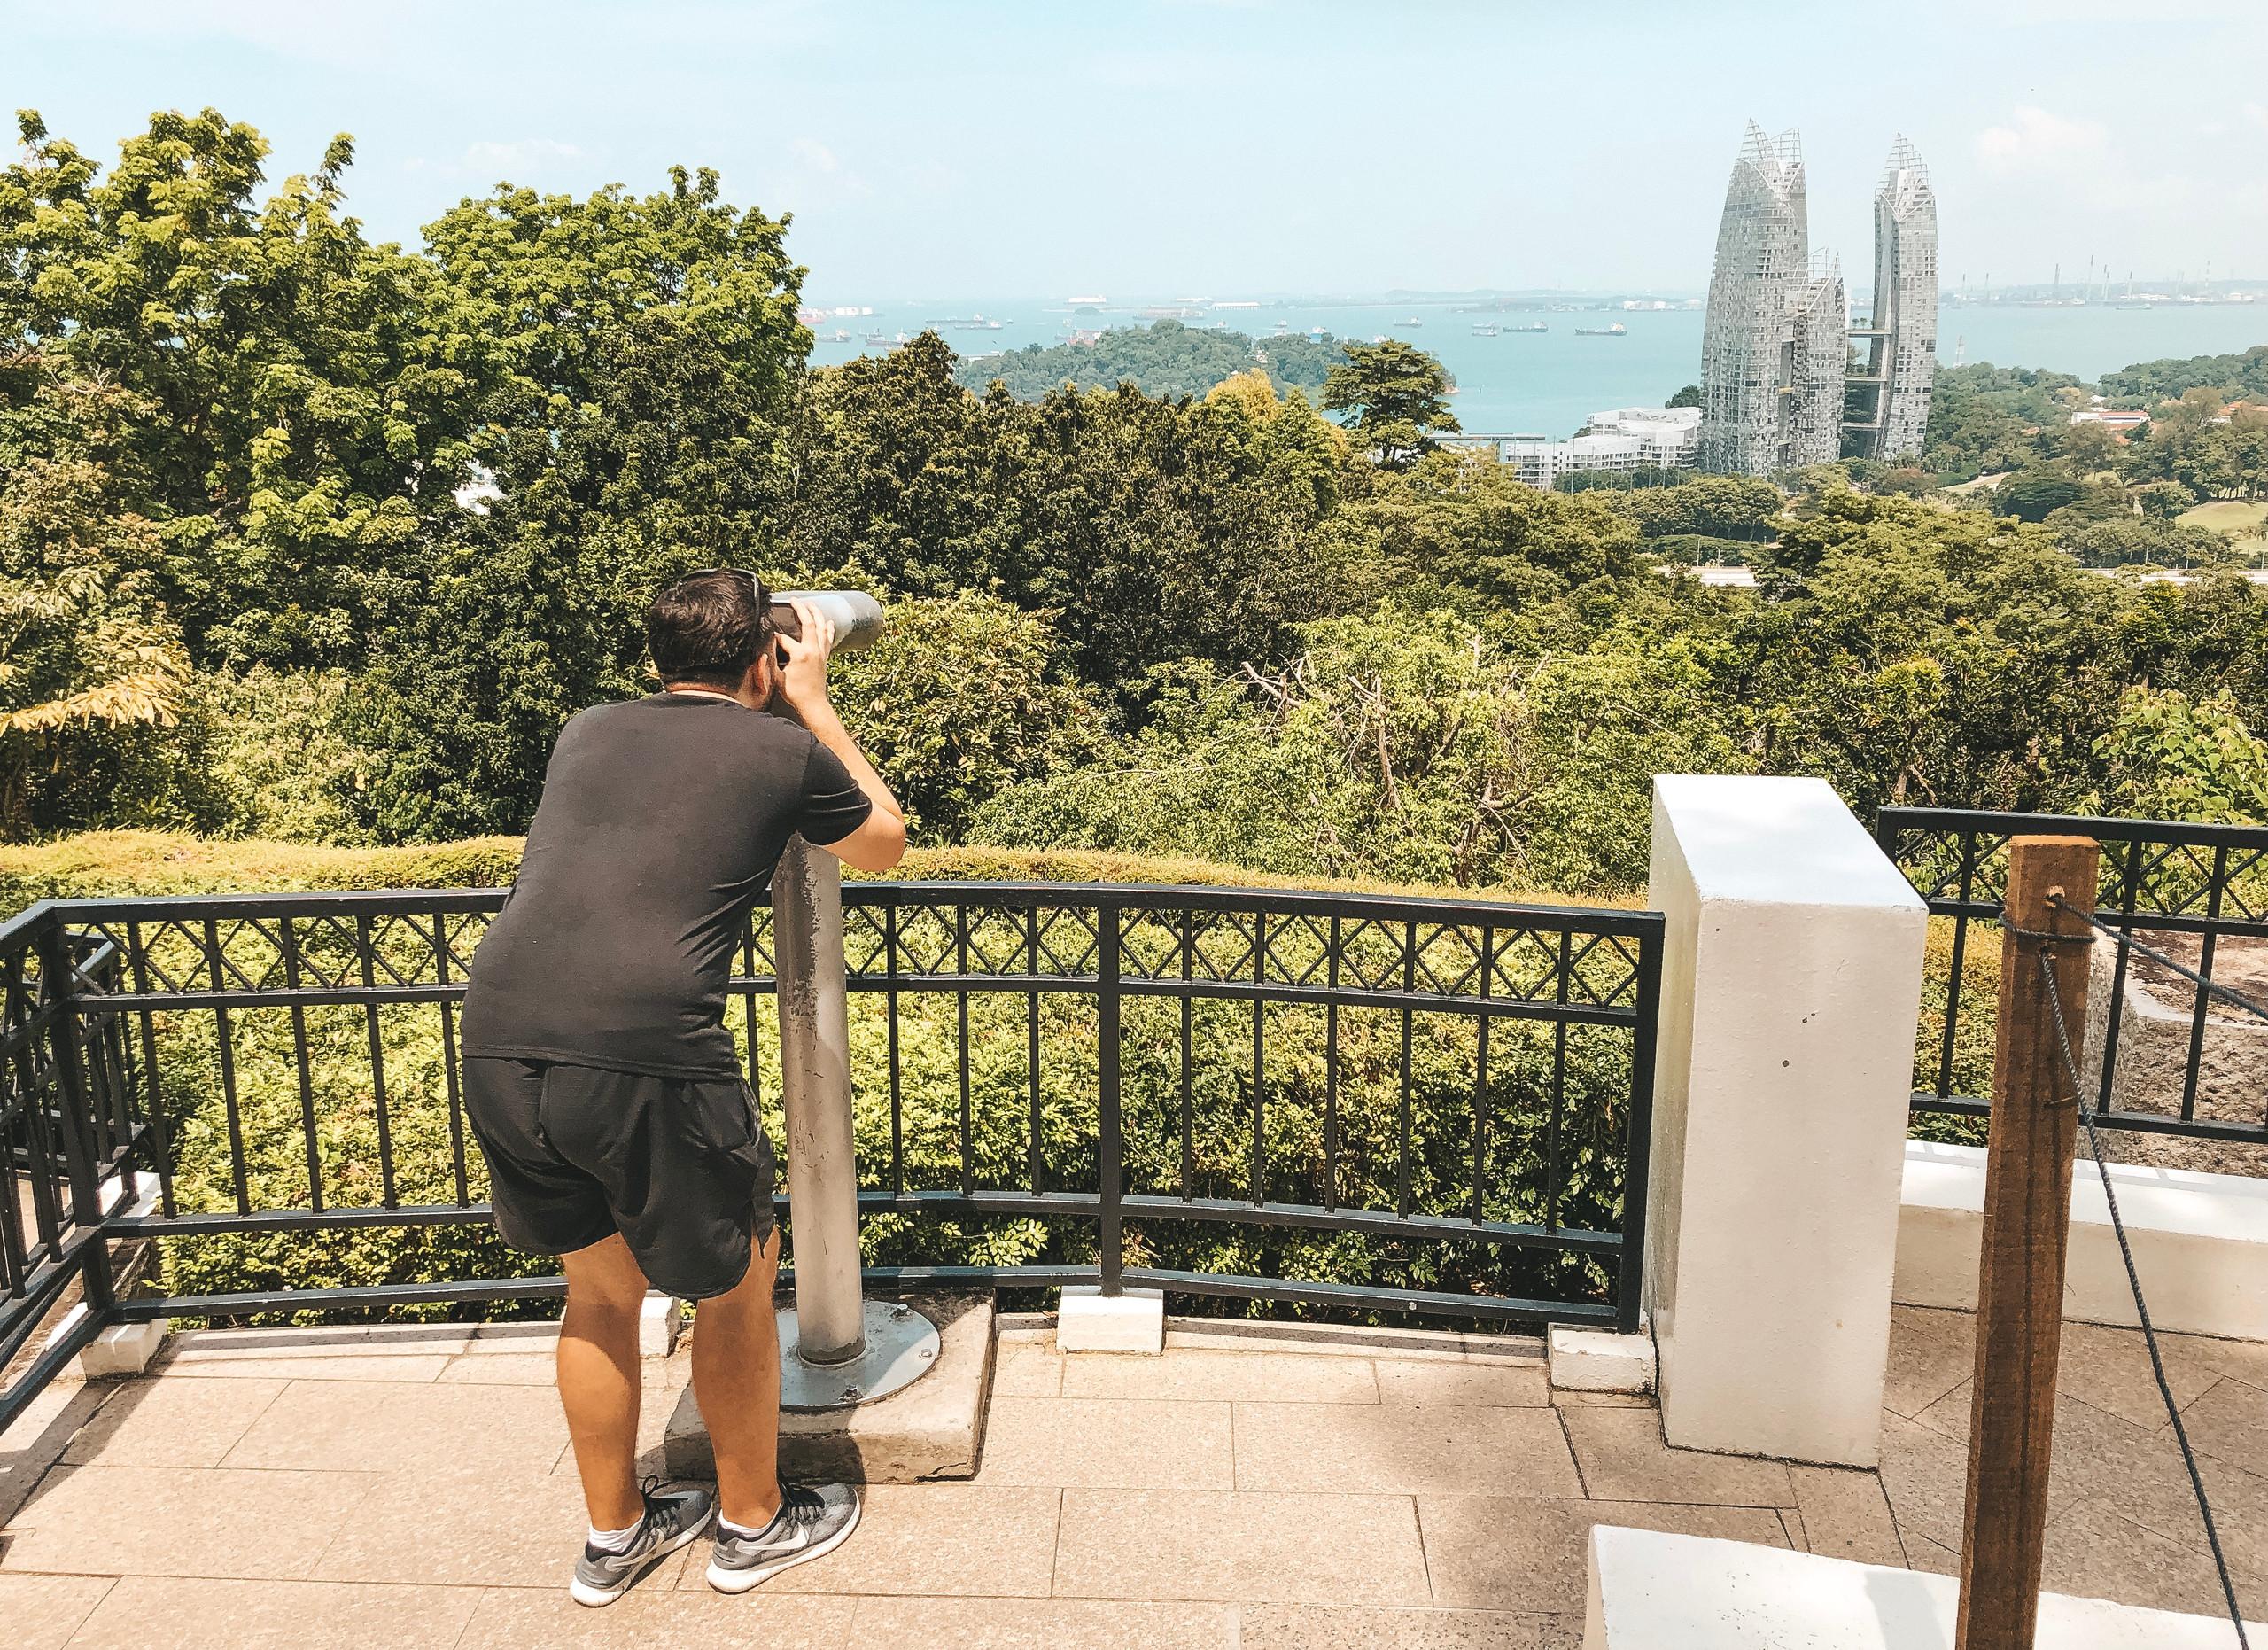 mount faber park singapore telescope look out point southern ridges